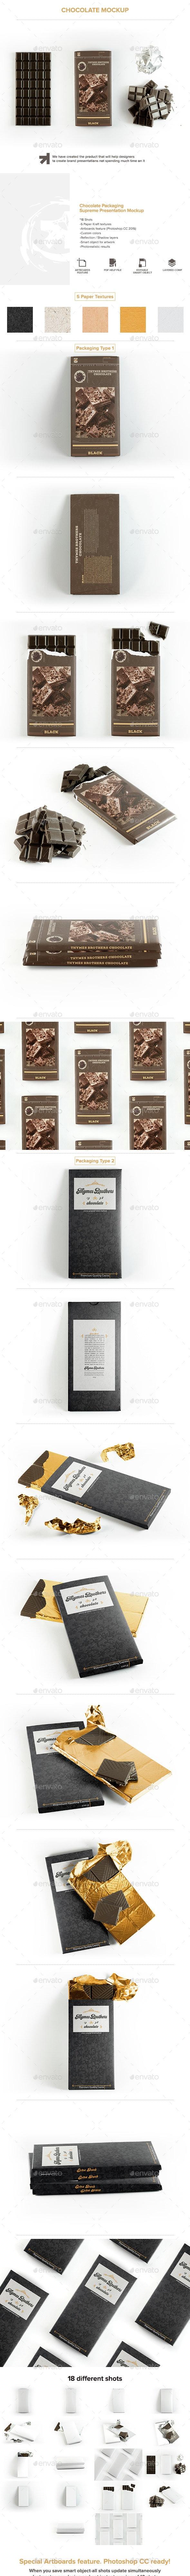 Chocolate Bar Packaging Mockup - Food and Drink Packaging